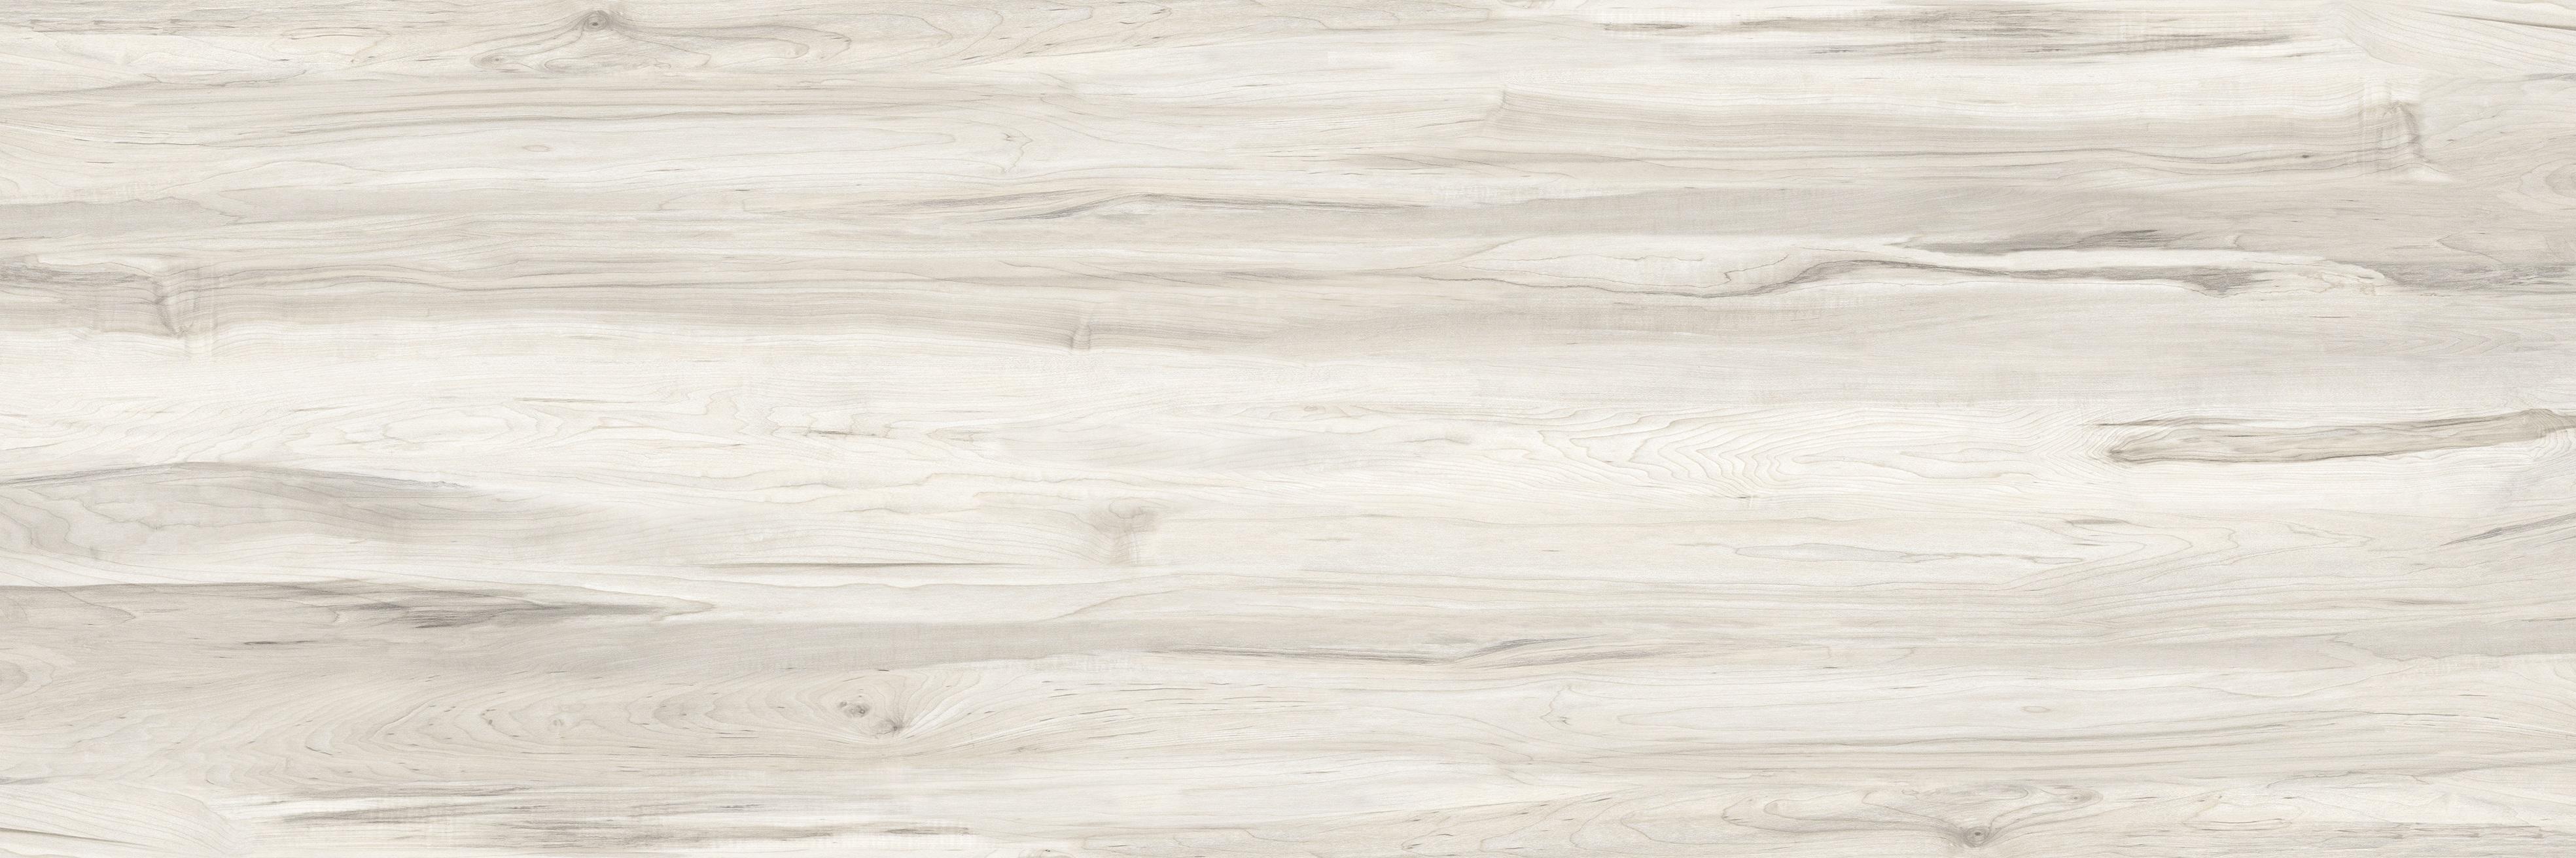 kostenlose foto : sand, holz, weiß, stock, material, bäume